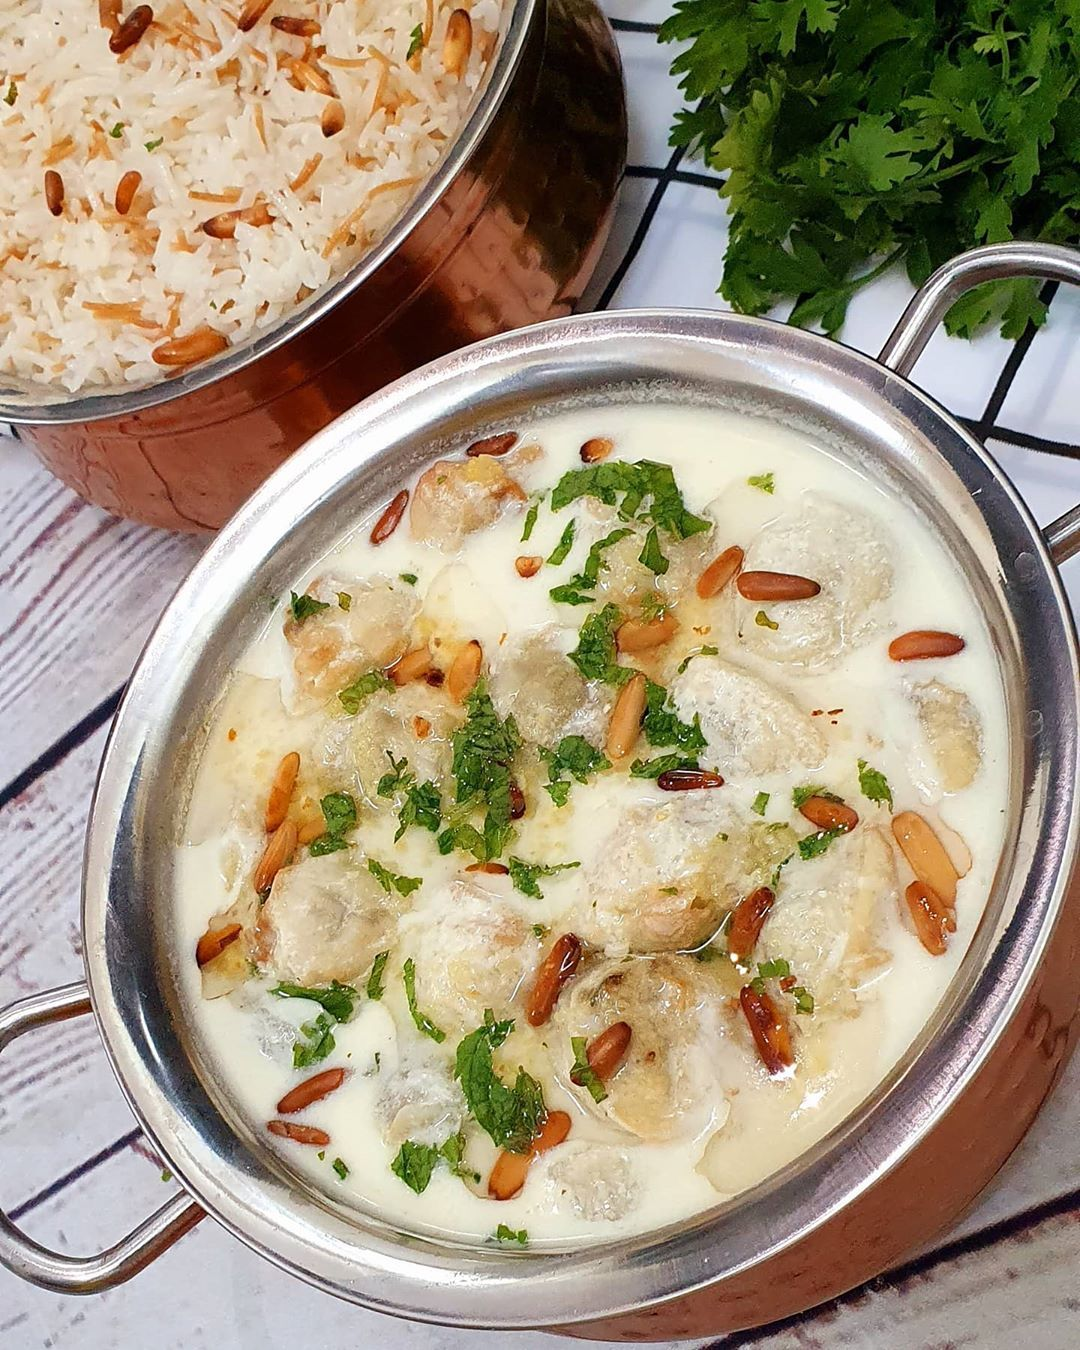 36 Likes 6 Comments Ayah Alhafez Chef Kitchen 86 On Instagram شيشبرك تعتبرأكلة الشيشبرك من الأكلات الشرقية القديمة والعريقة و Yummy Food Food Chowder